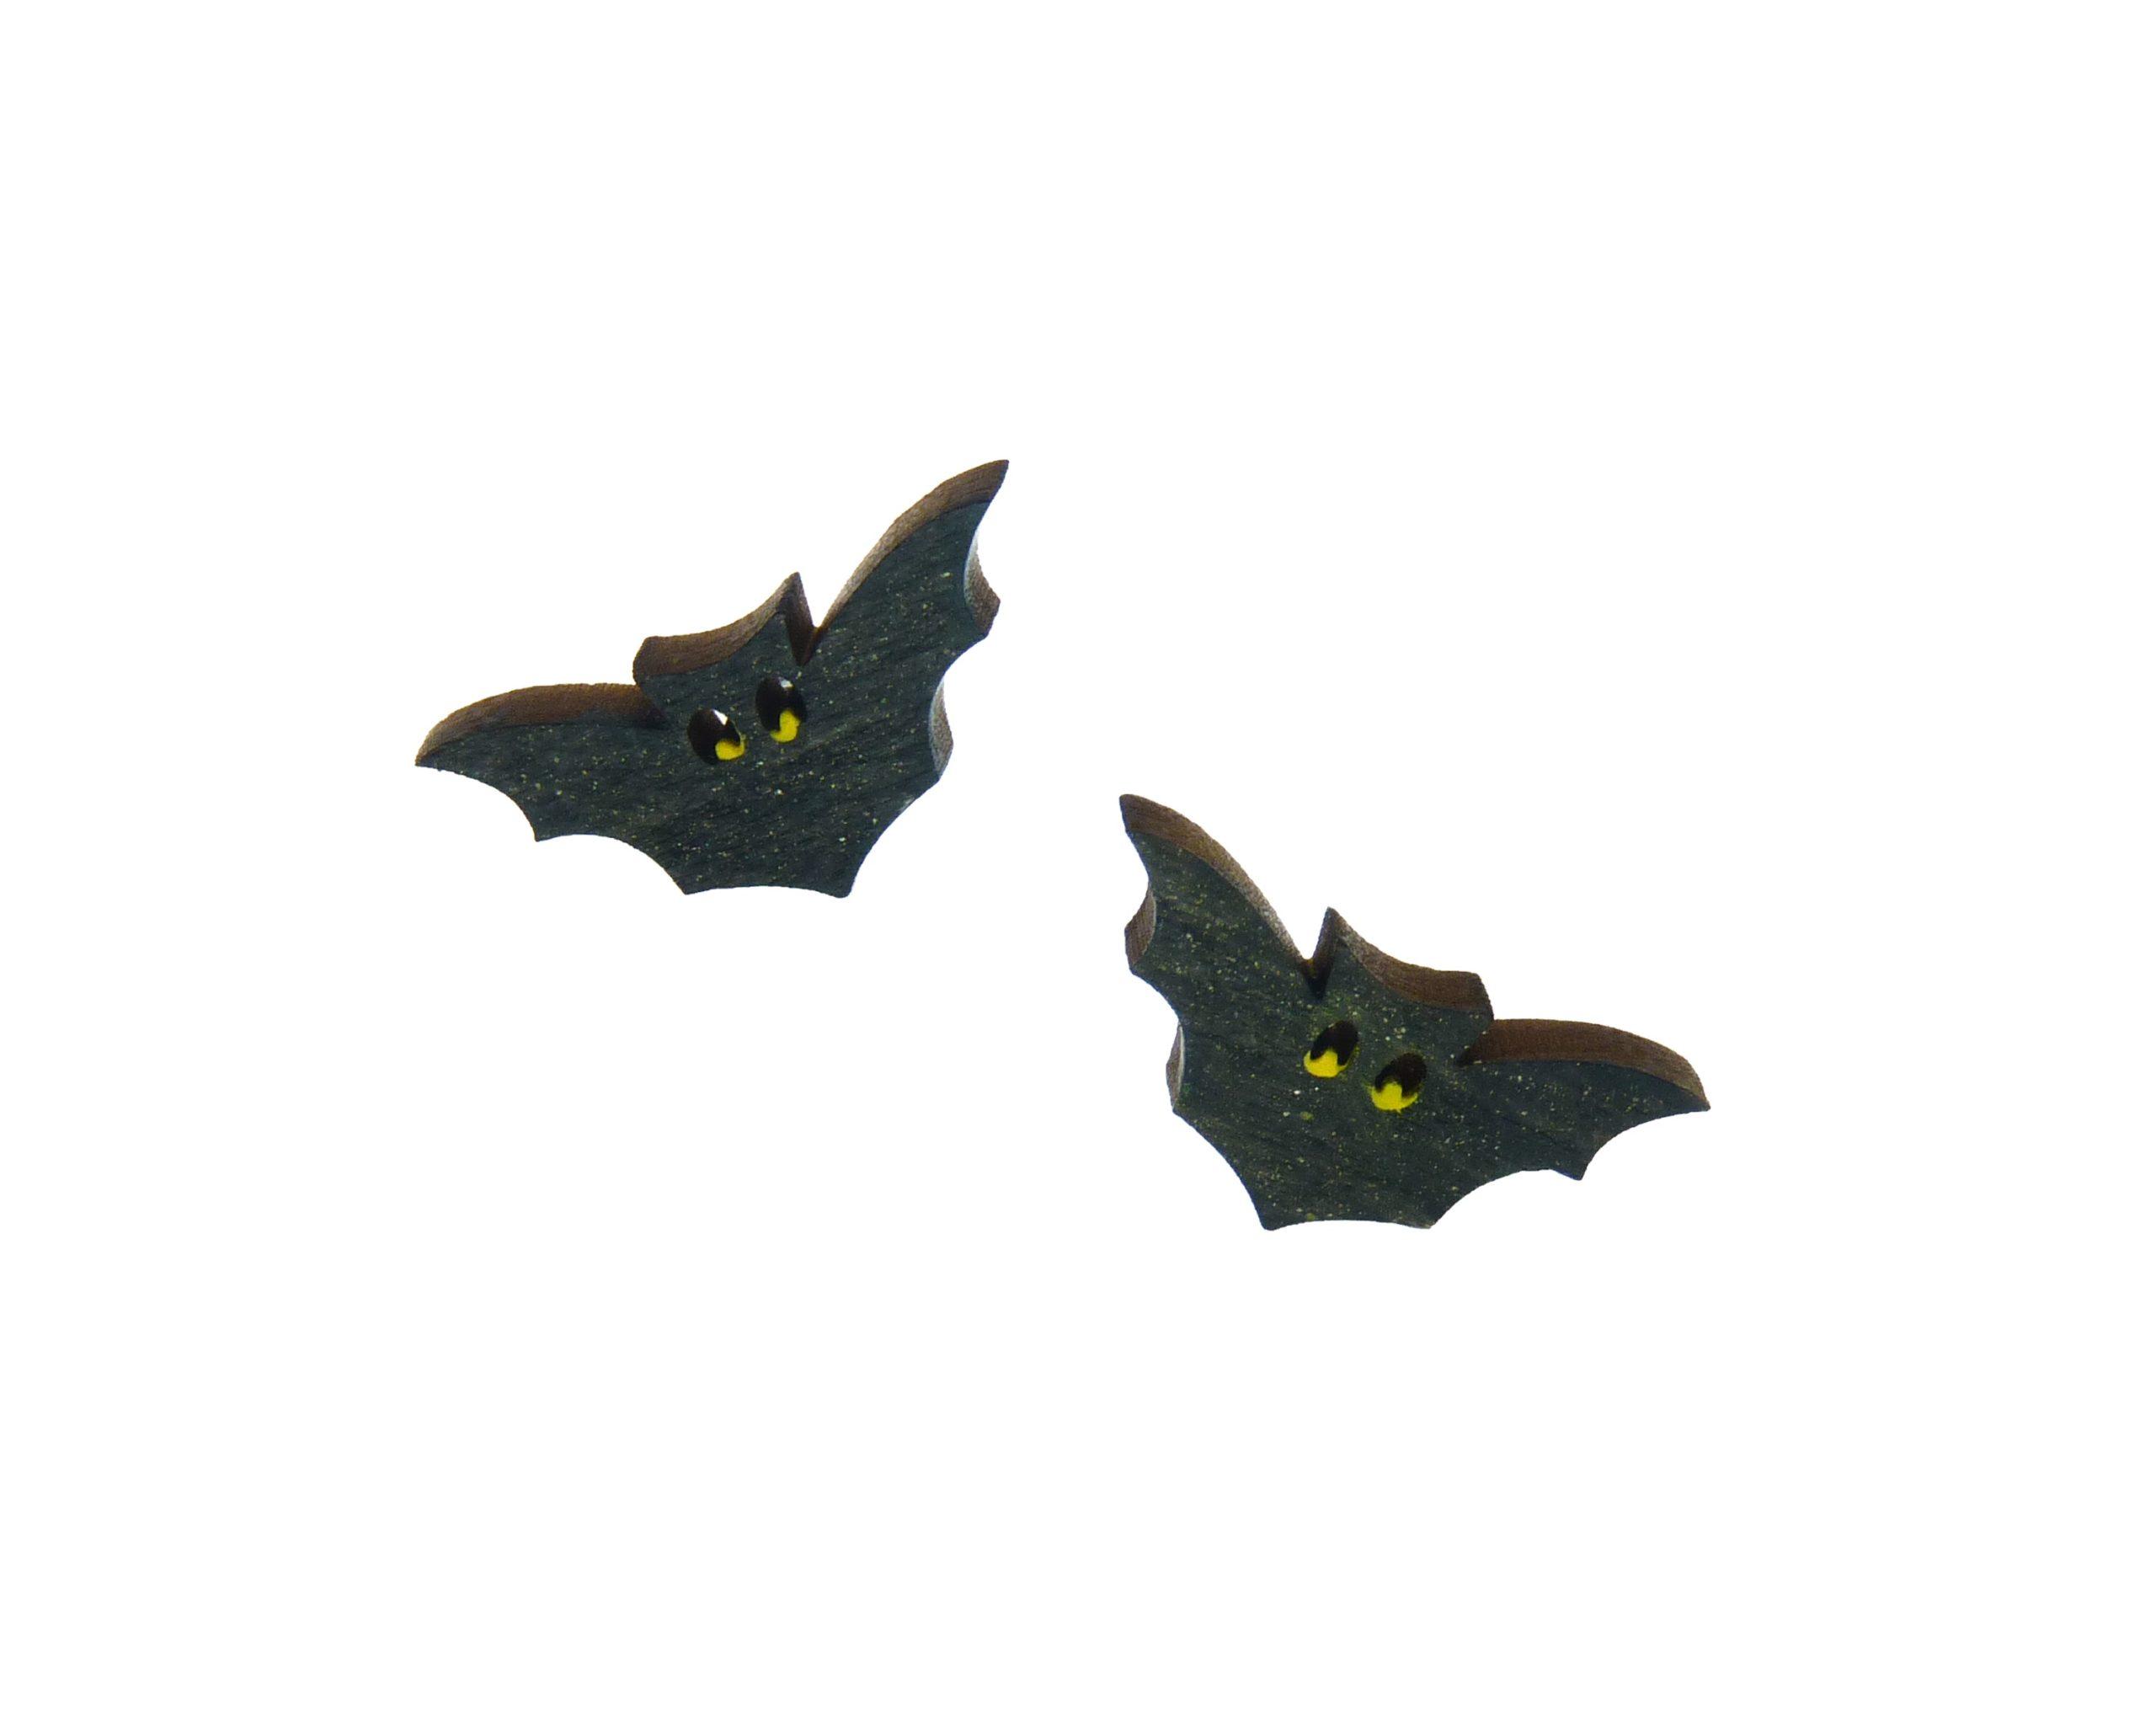 Bats Maple Hardwood Stud Earrings